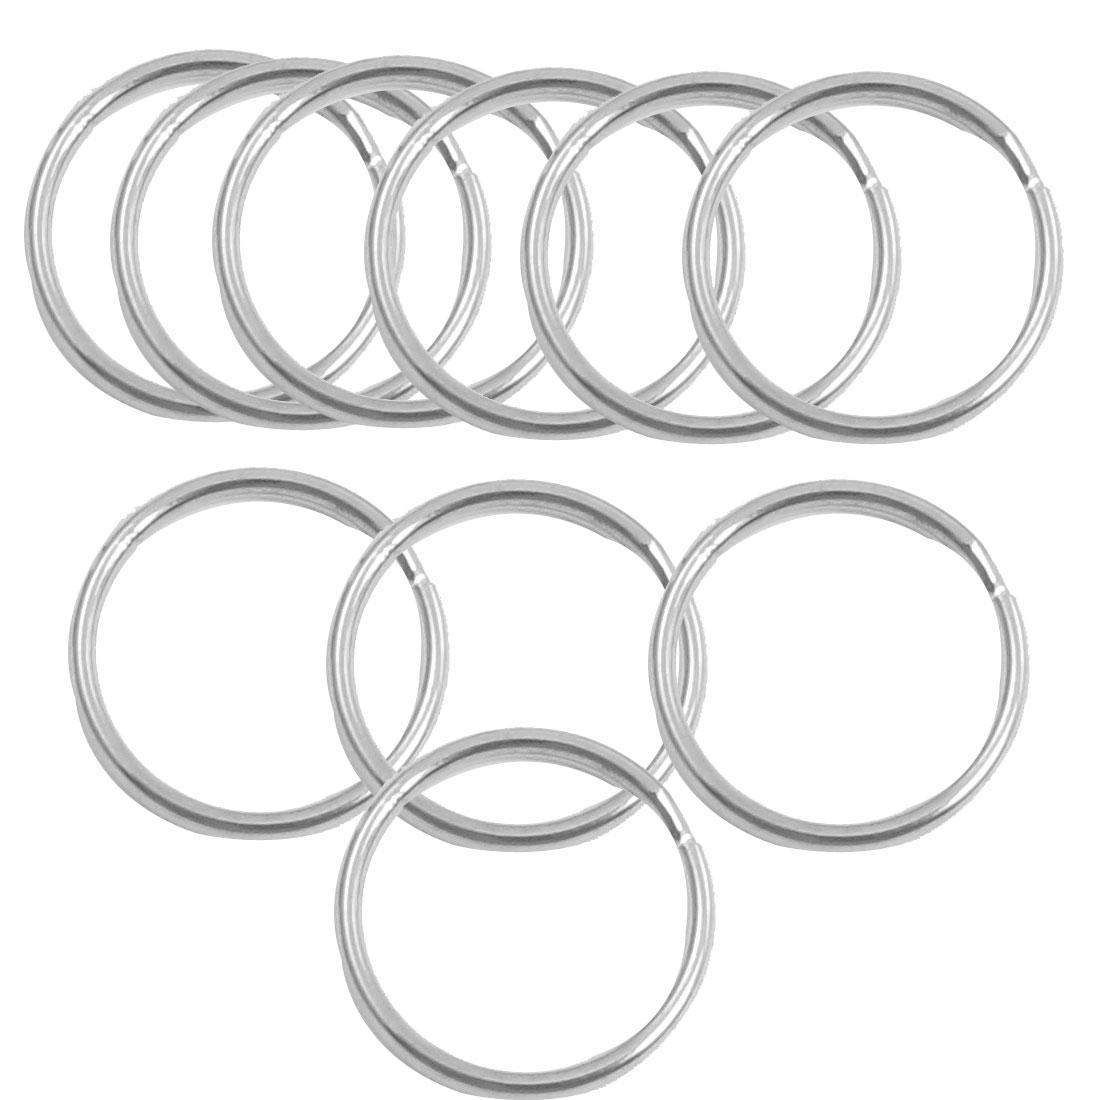 10 Pcs Glossy Metal Silver Tone Split Ring Key Rings